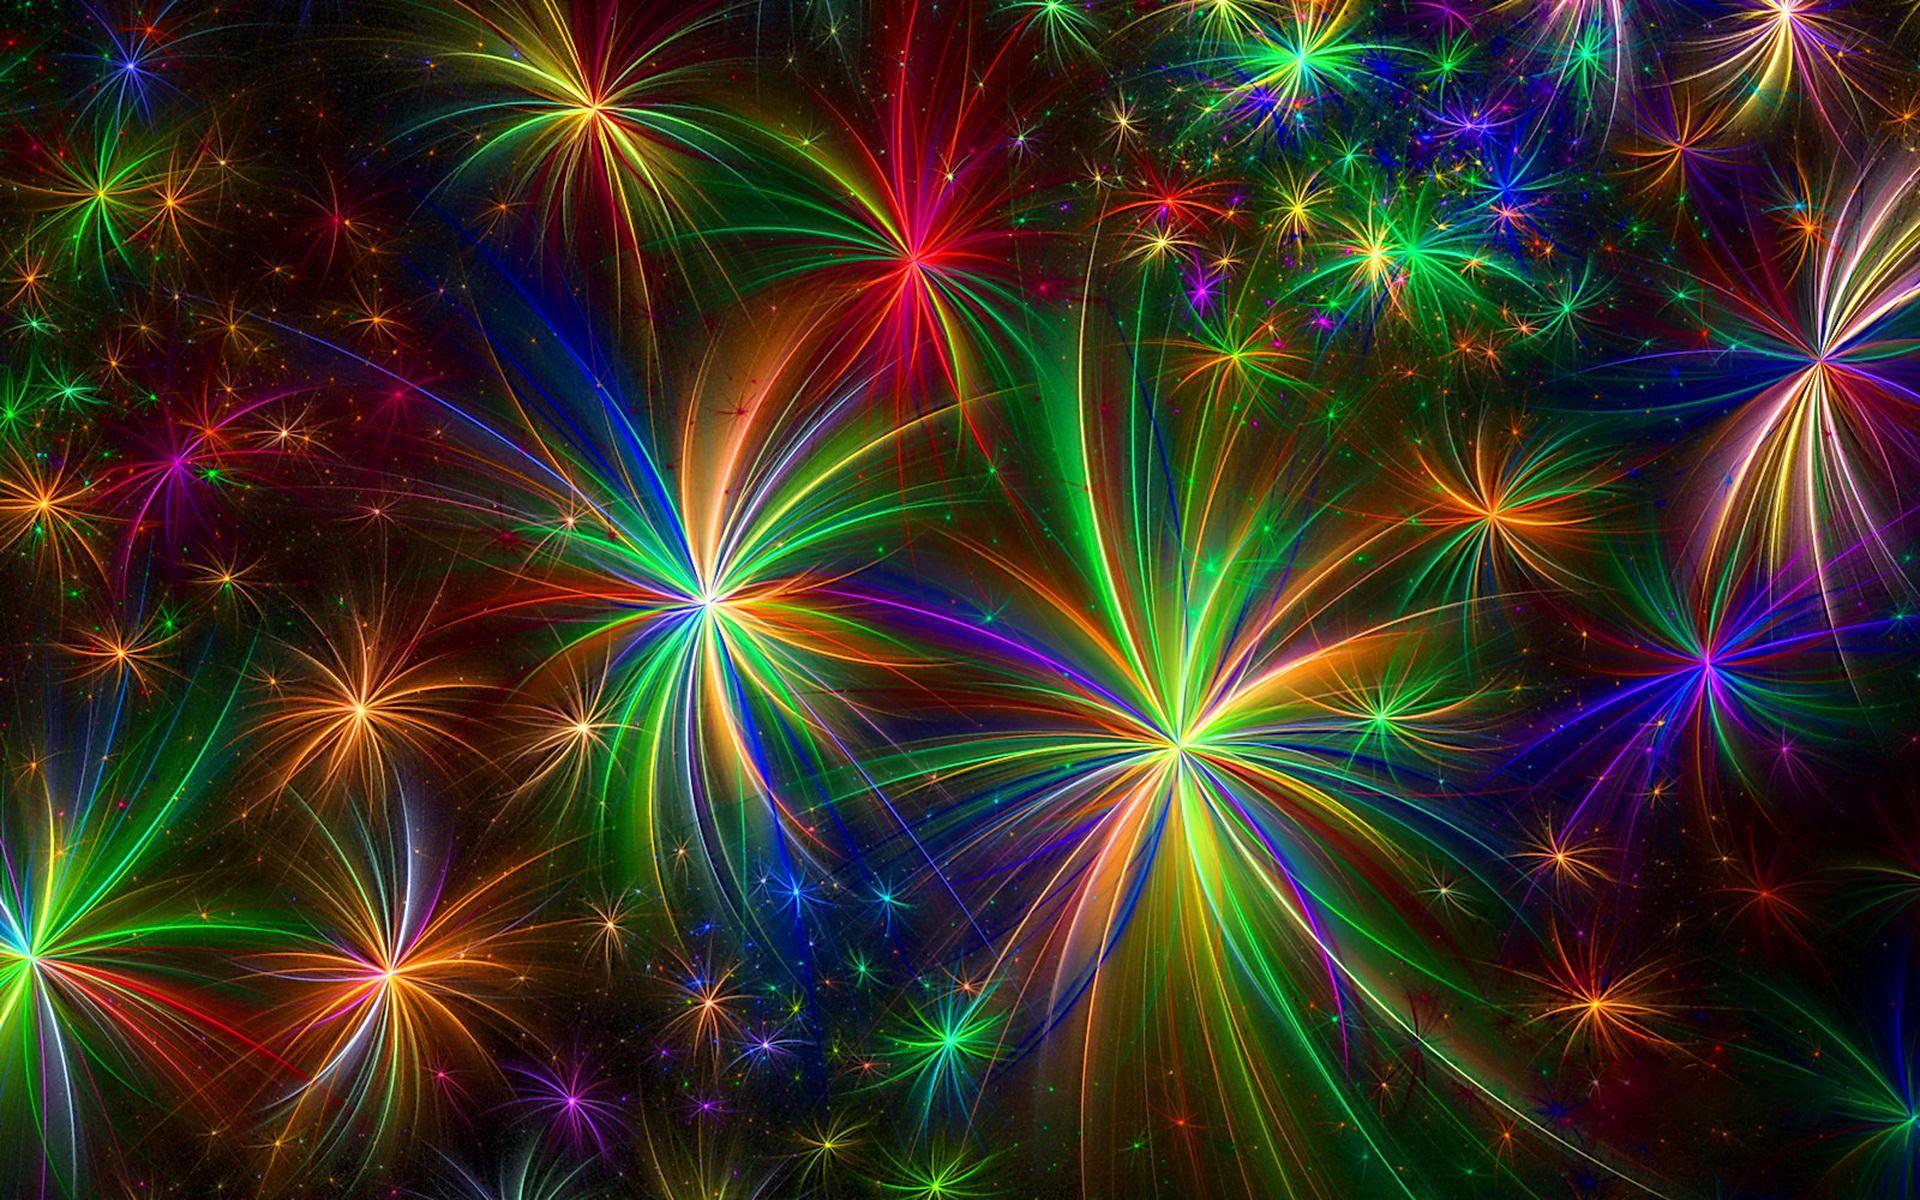 Blue Fireworks Wallpapers - Top Free Blue Fireworks ...